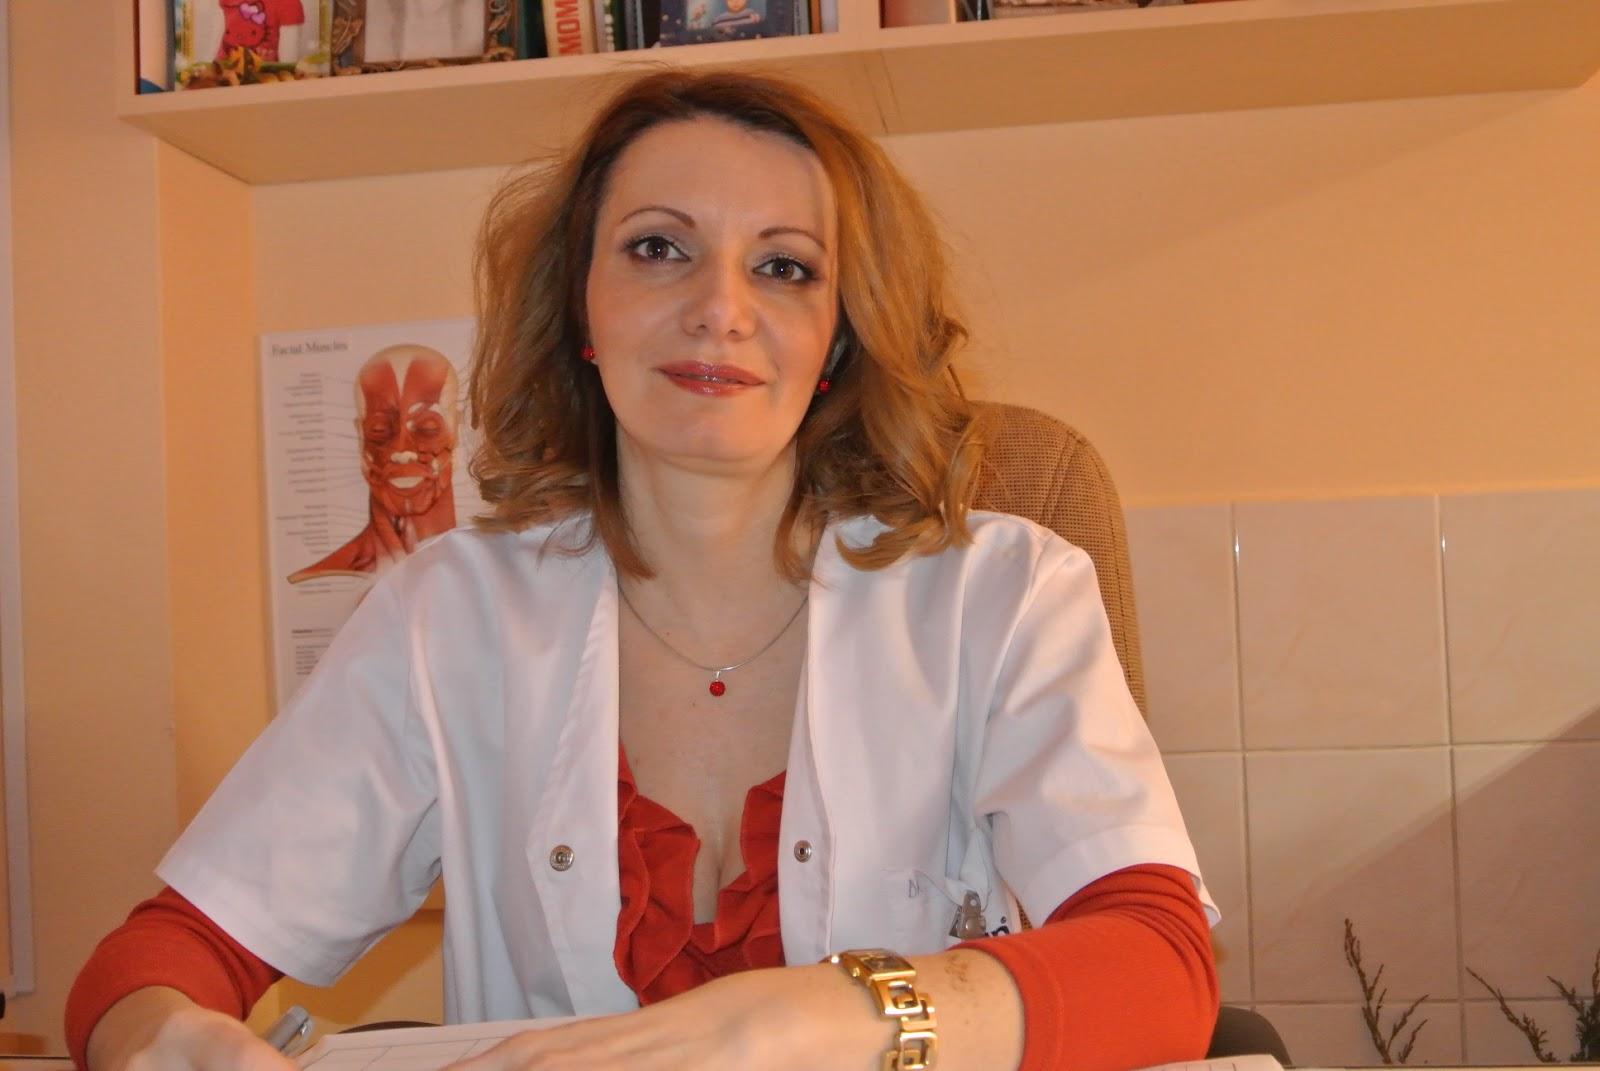 Crioterapia, metoda de tratament pentru veruci, cheratoze, papiloame | hpv.iubescstudentia.ro